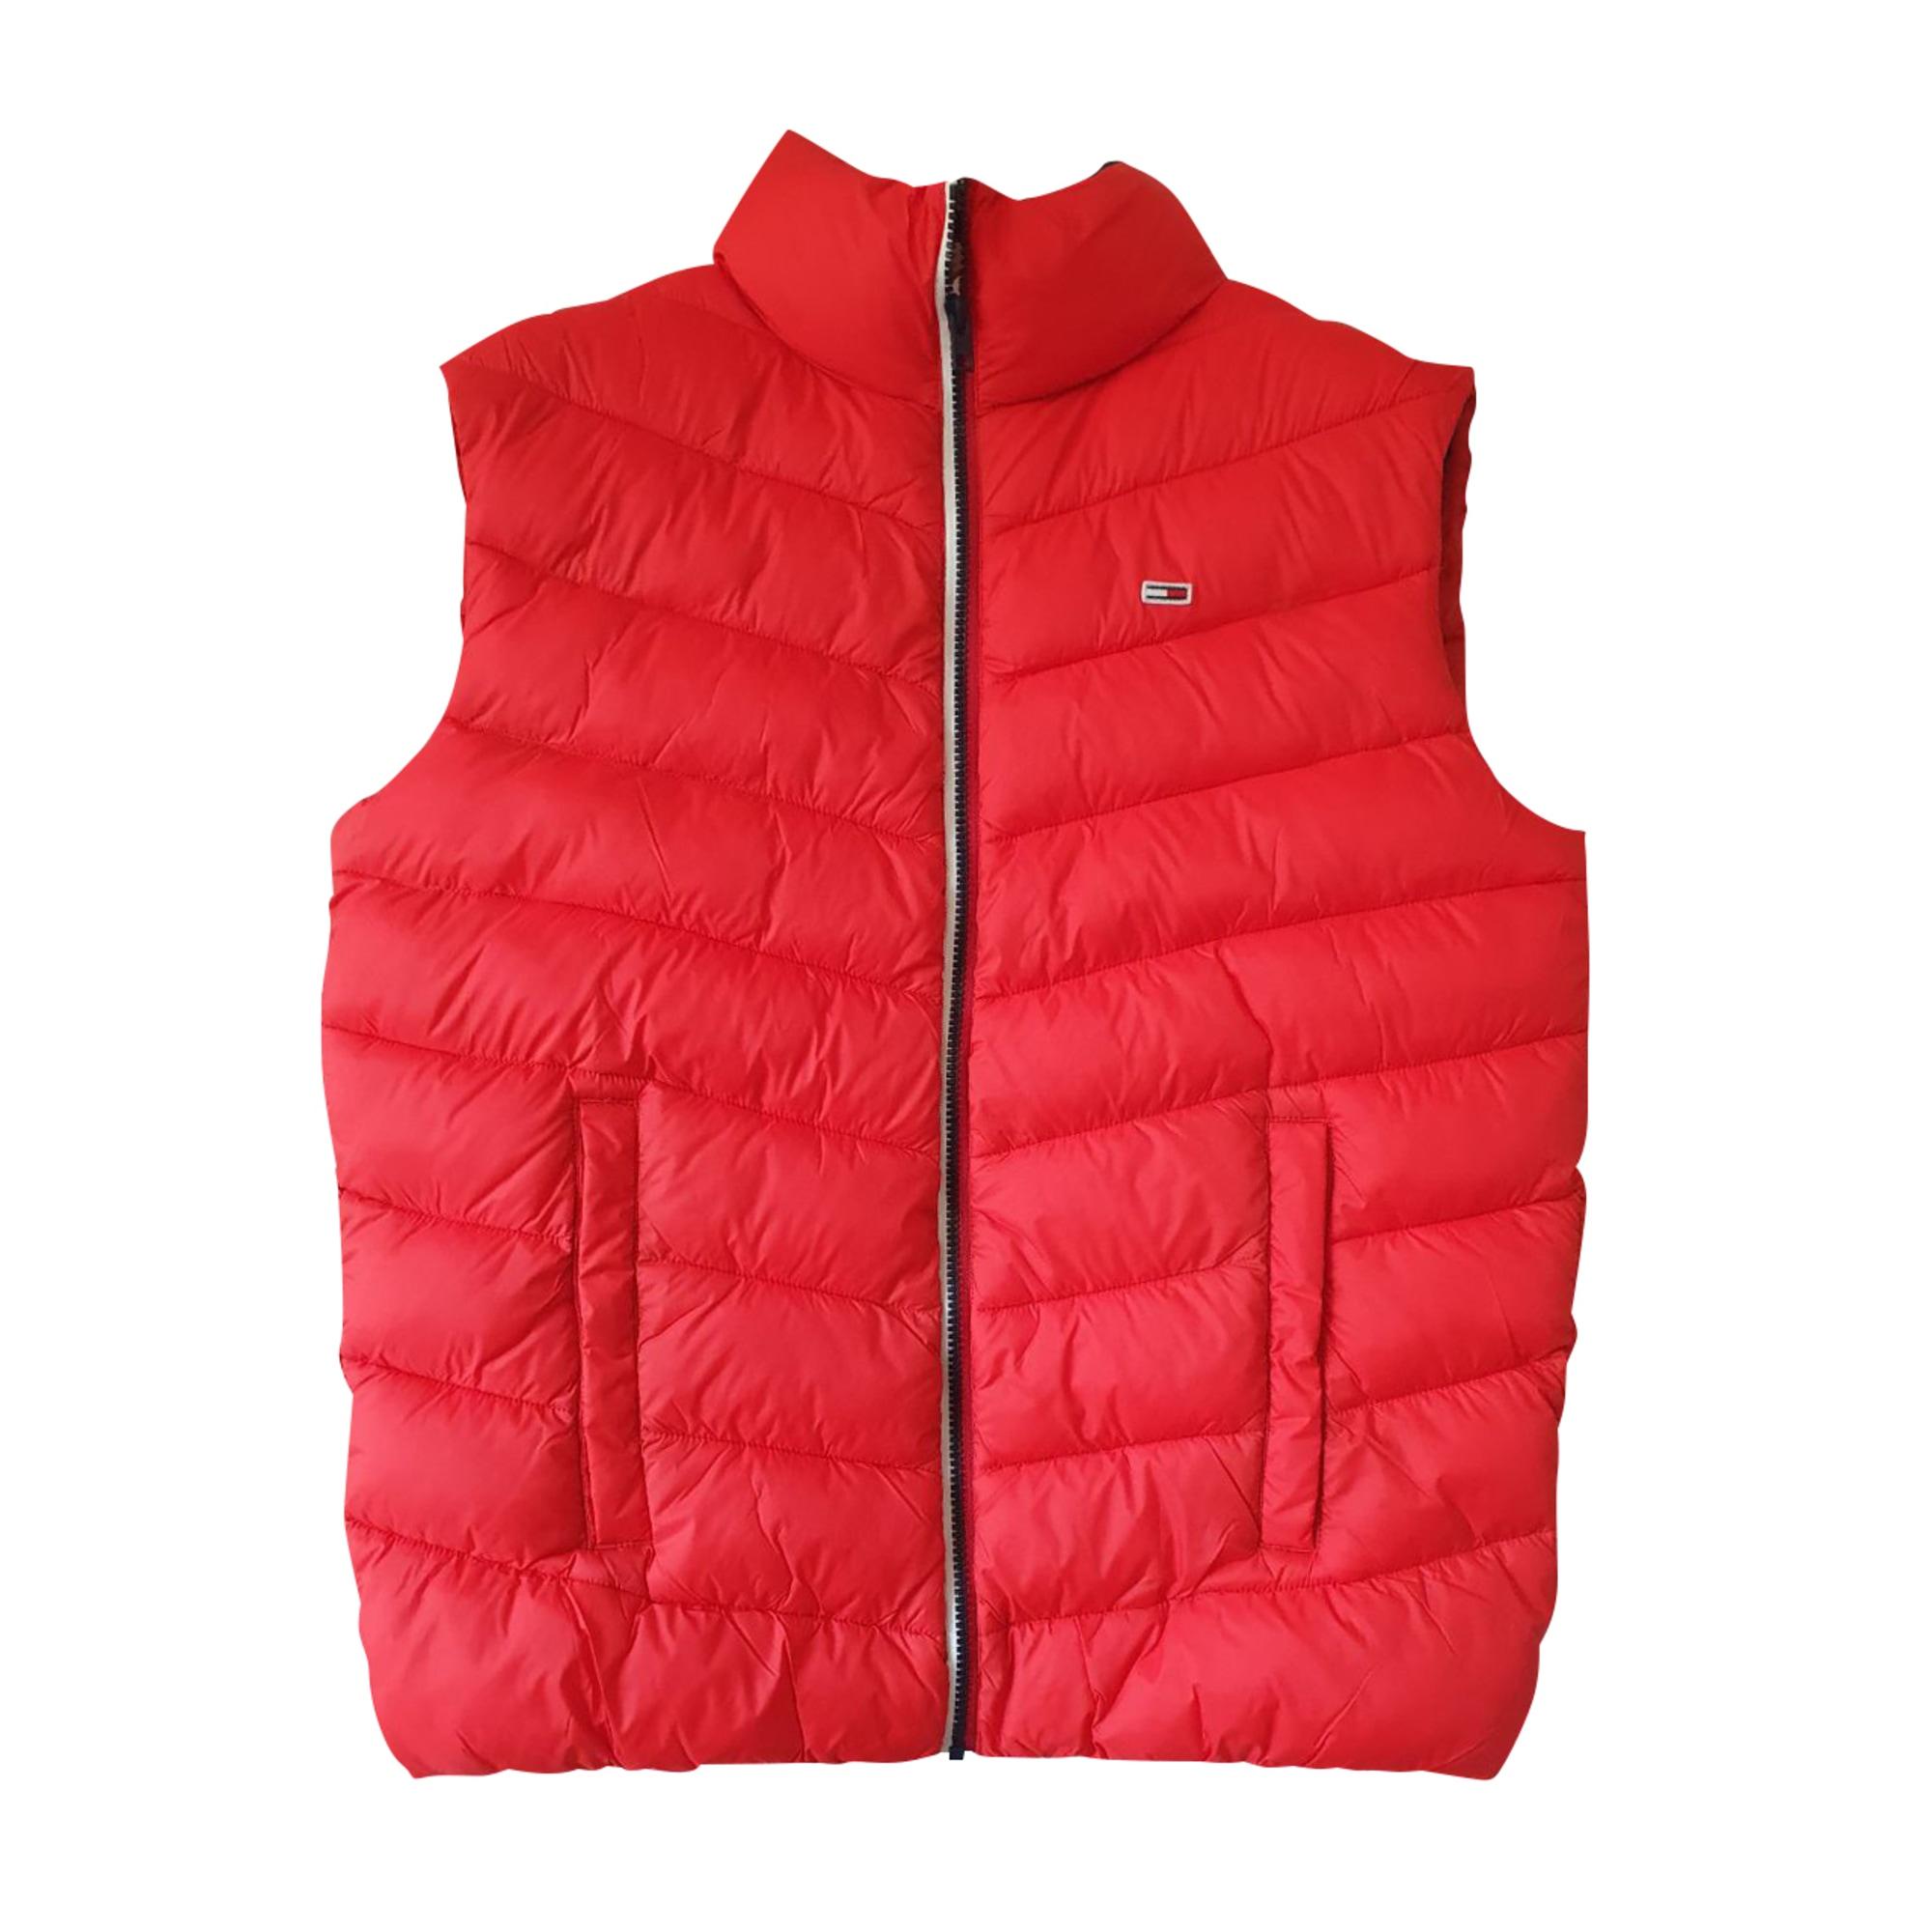 Down Jacket TOMMY HILFIGER Red, burgundy